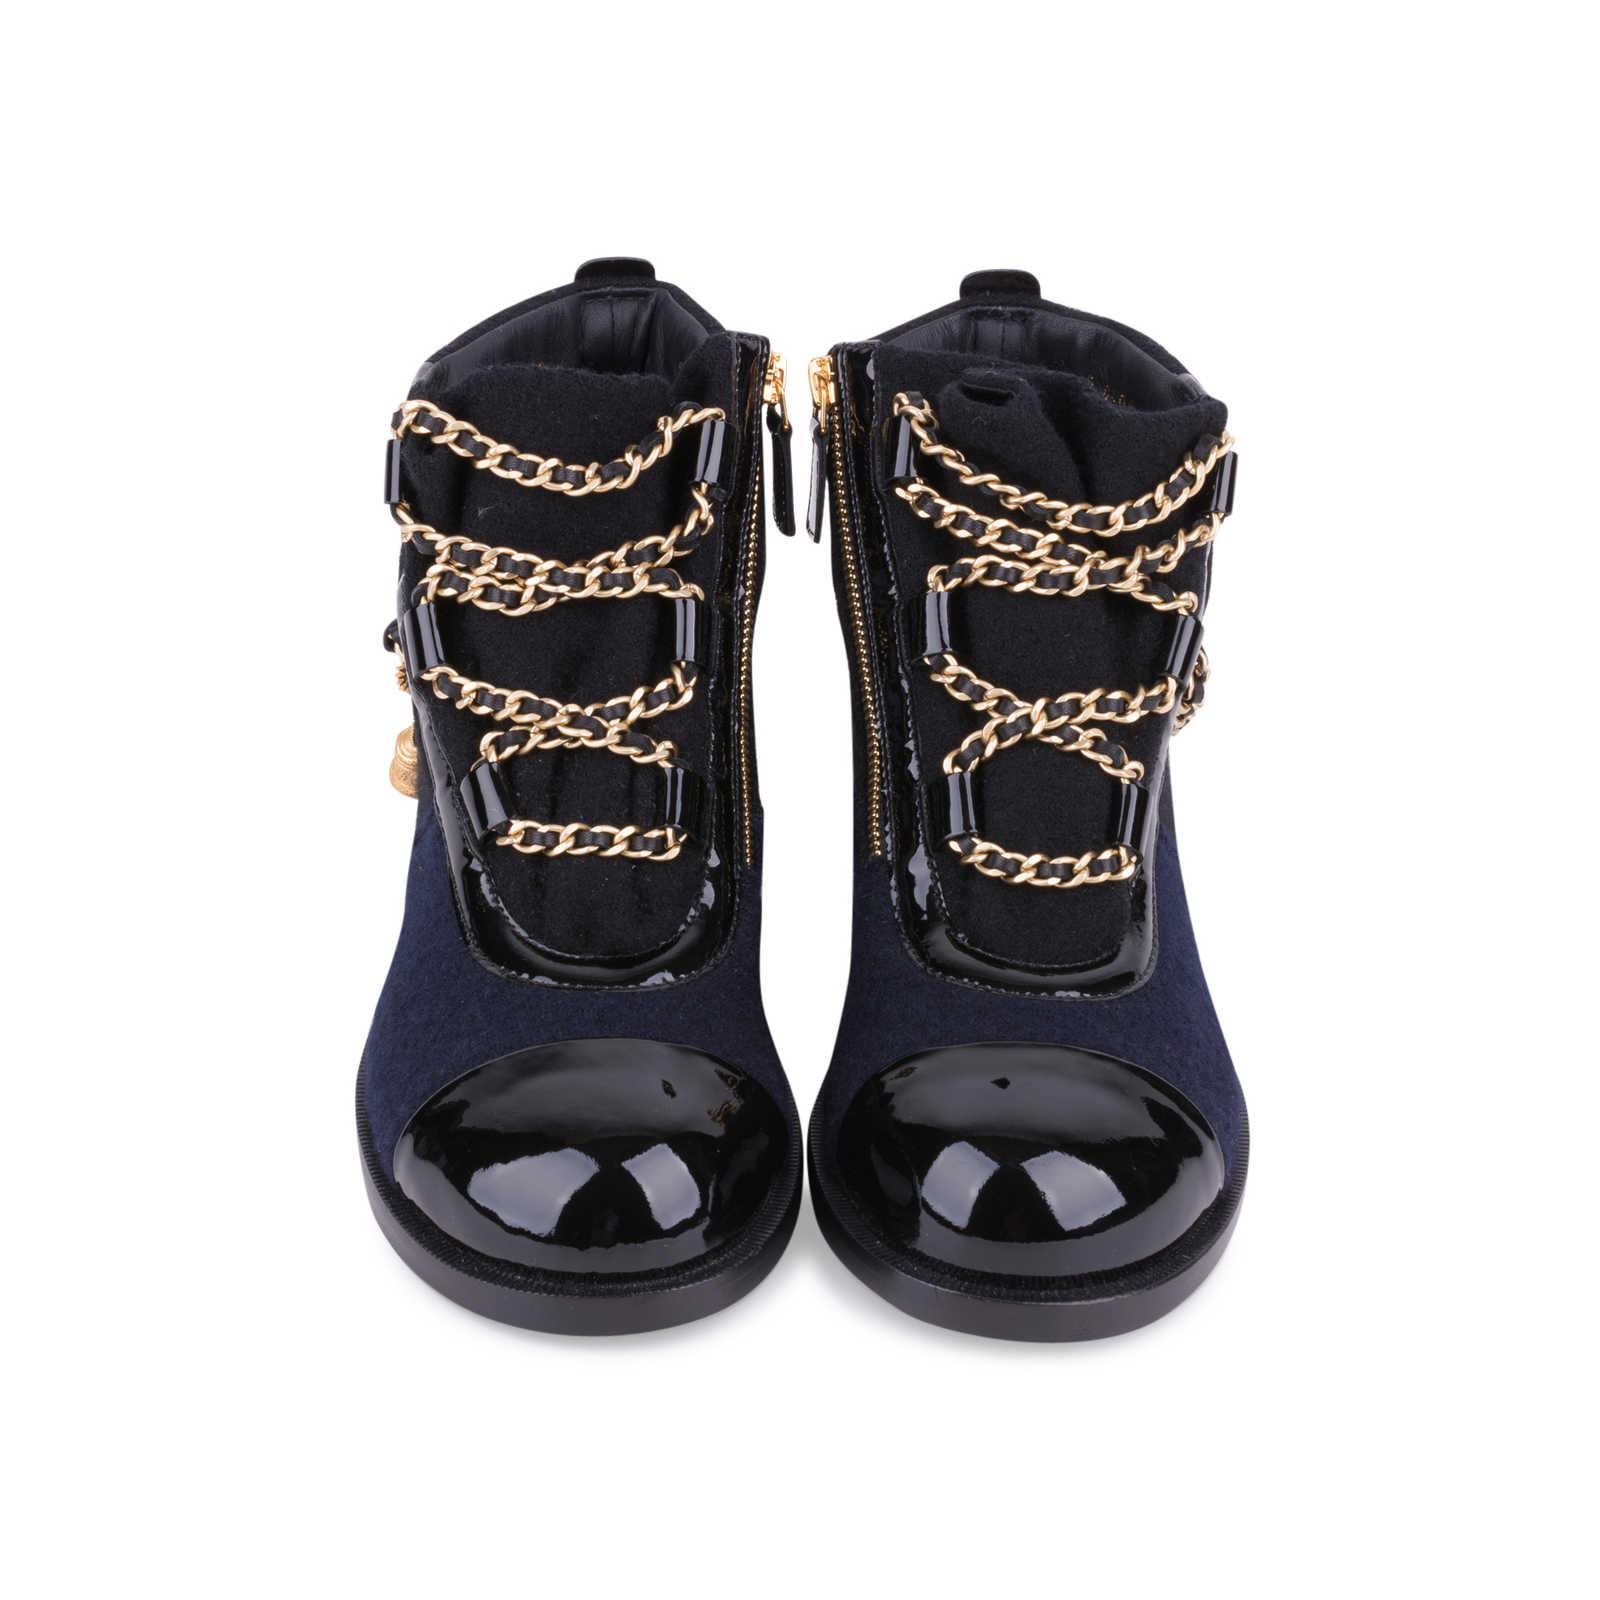 7f601db17 Authentic Second Hand Chanel Paris Salzburg Charm Ankle Boots  (PSS-200-01686) ...